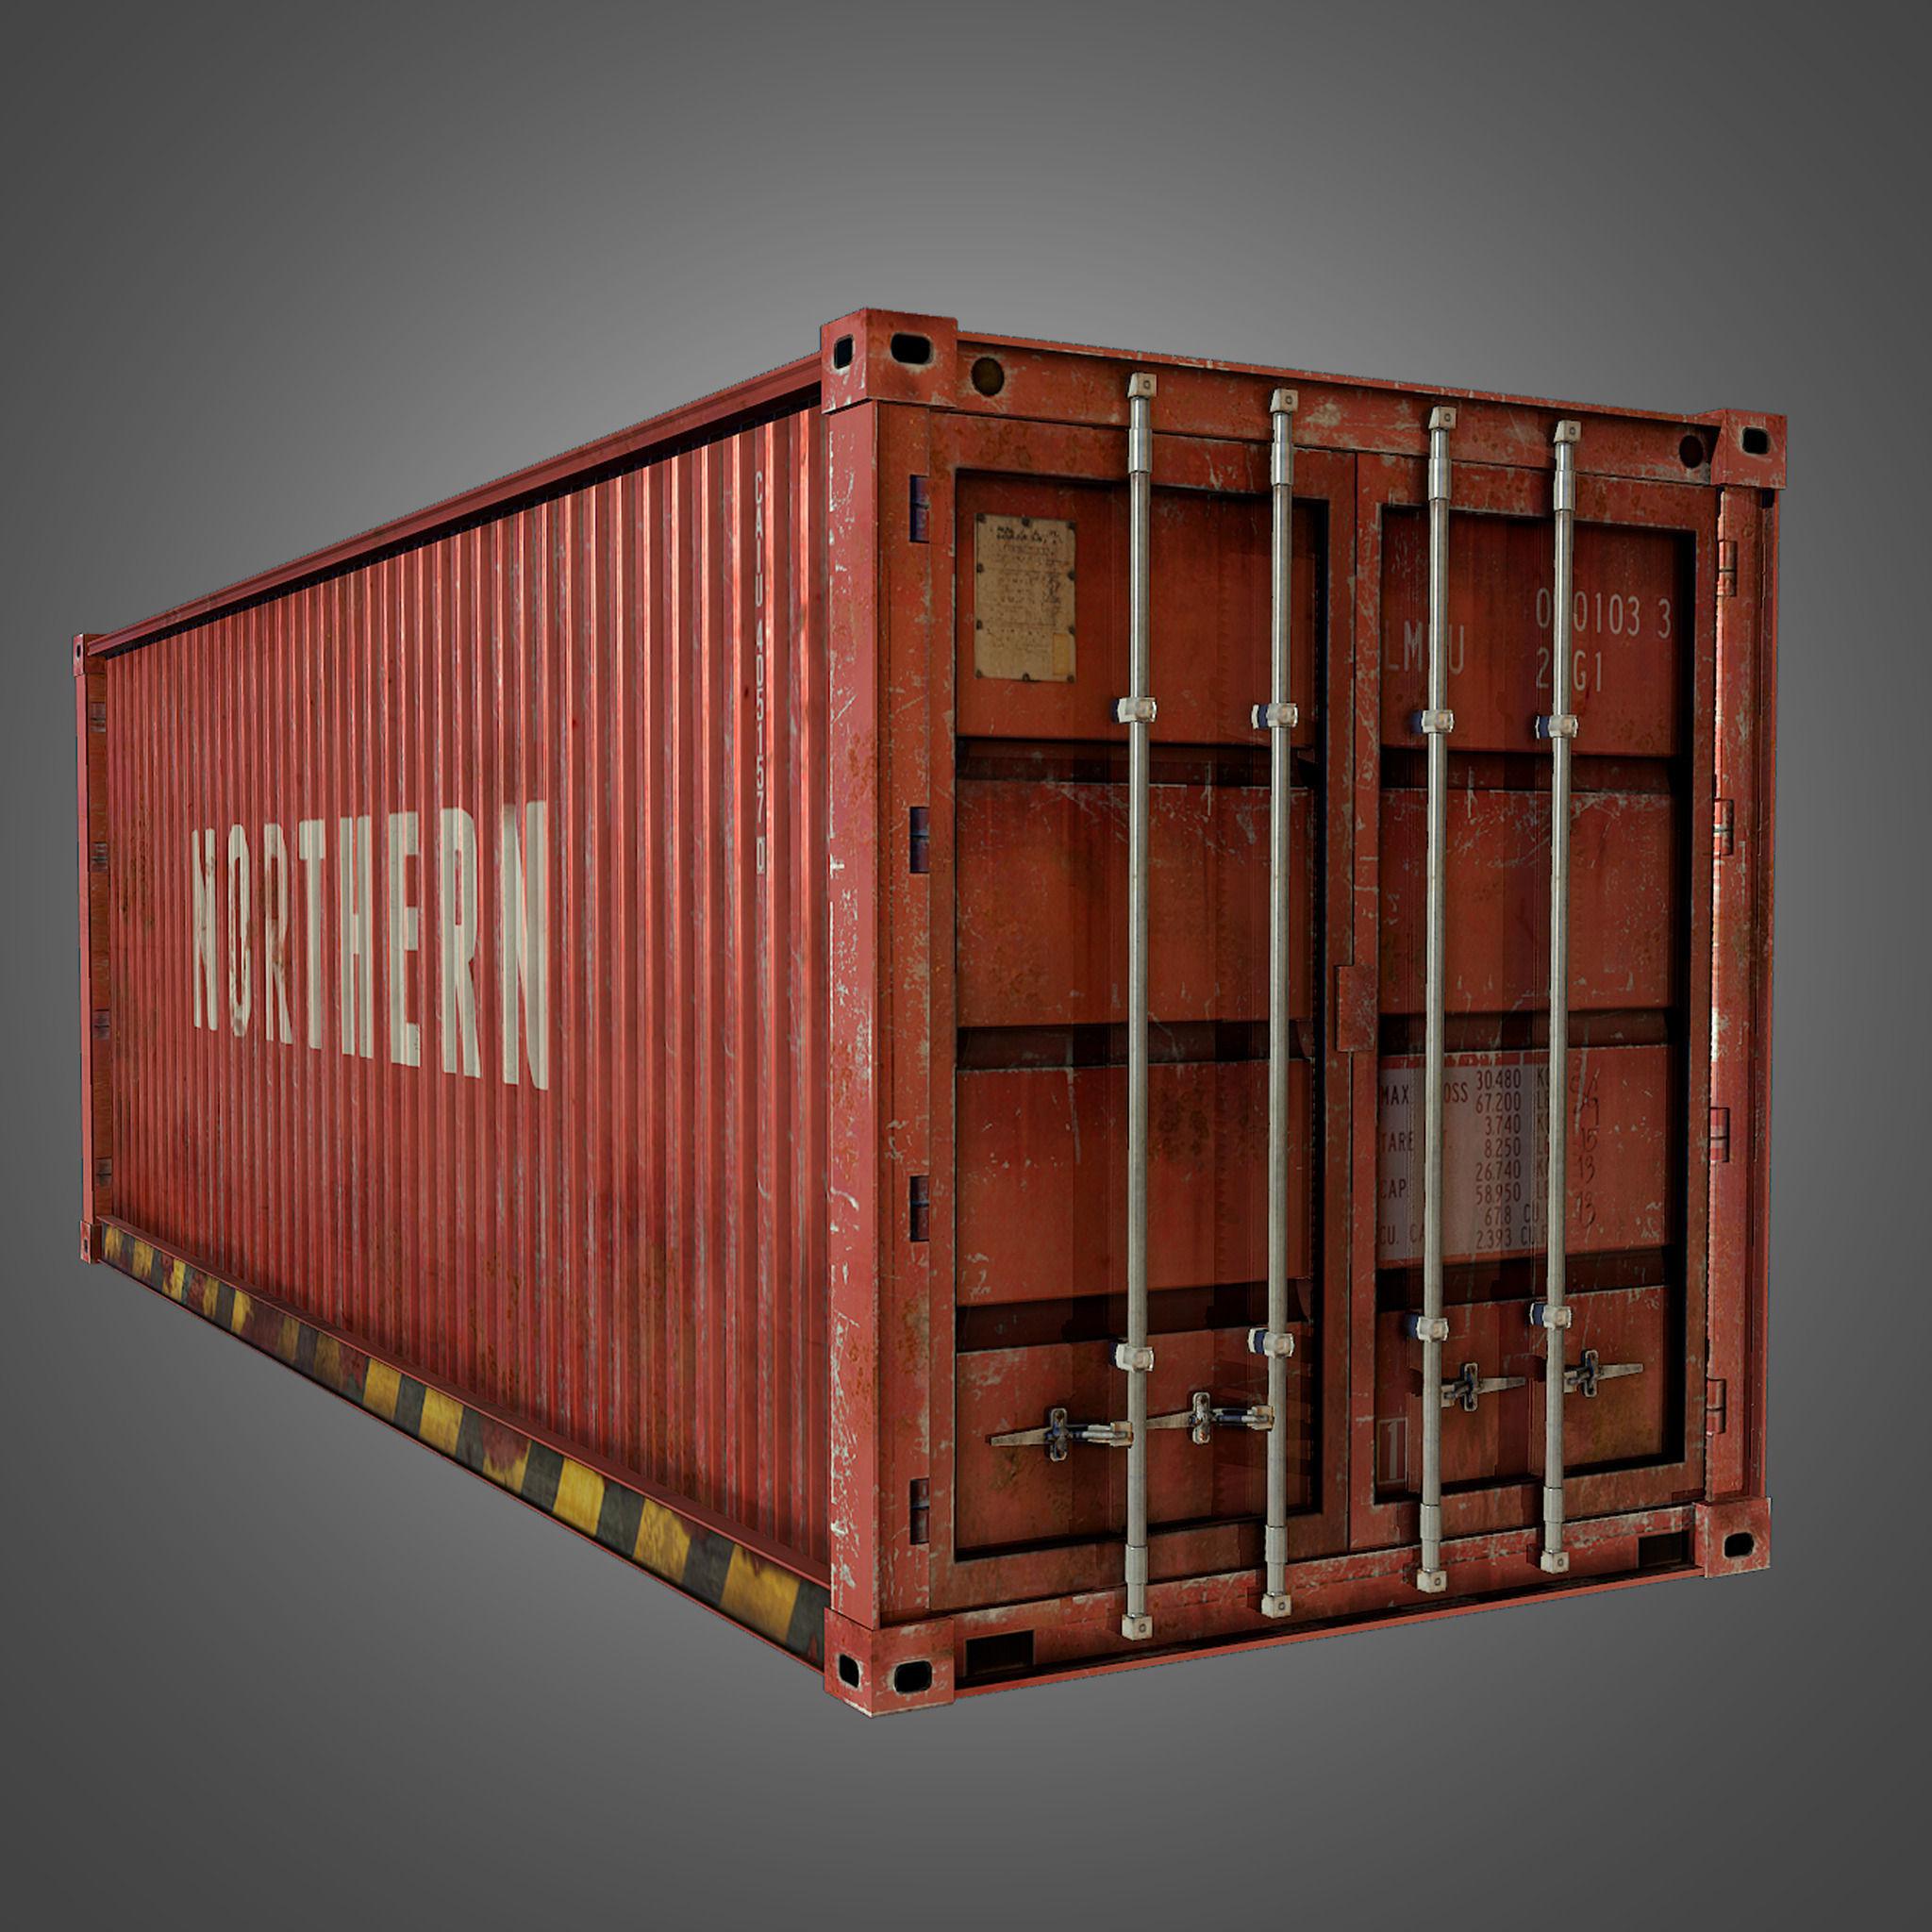 ... cargo container conex 3d model low-poly obj fbx dae tga 8